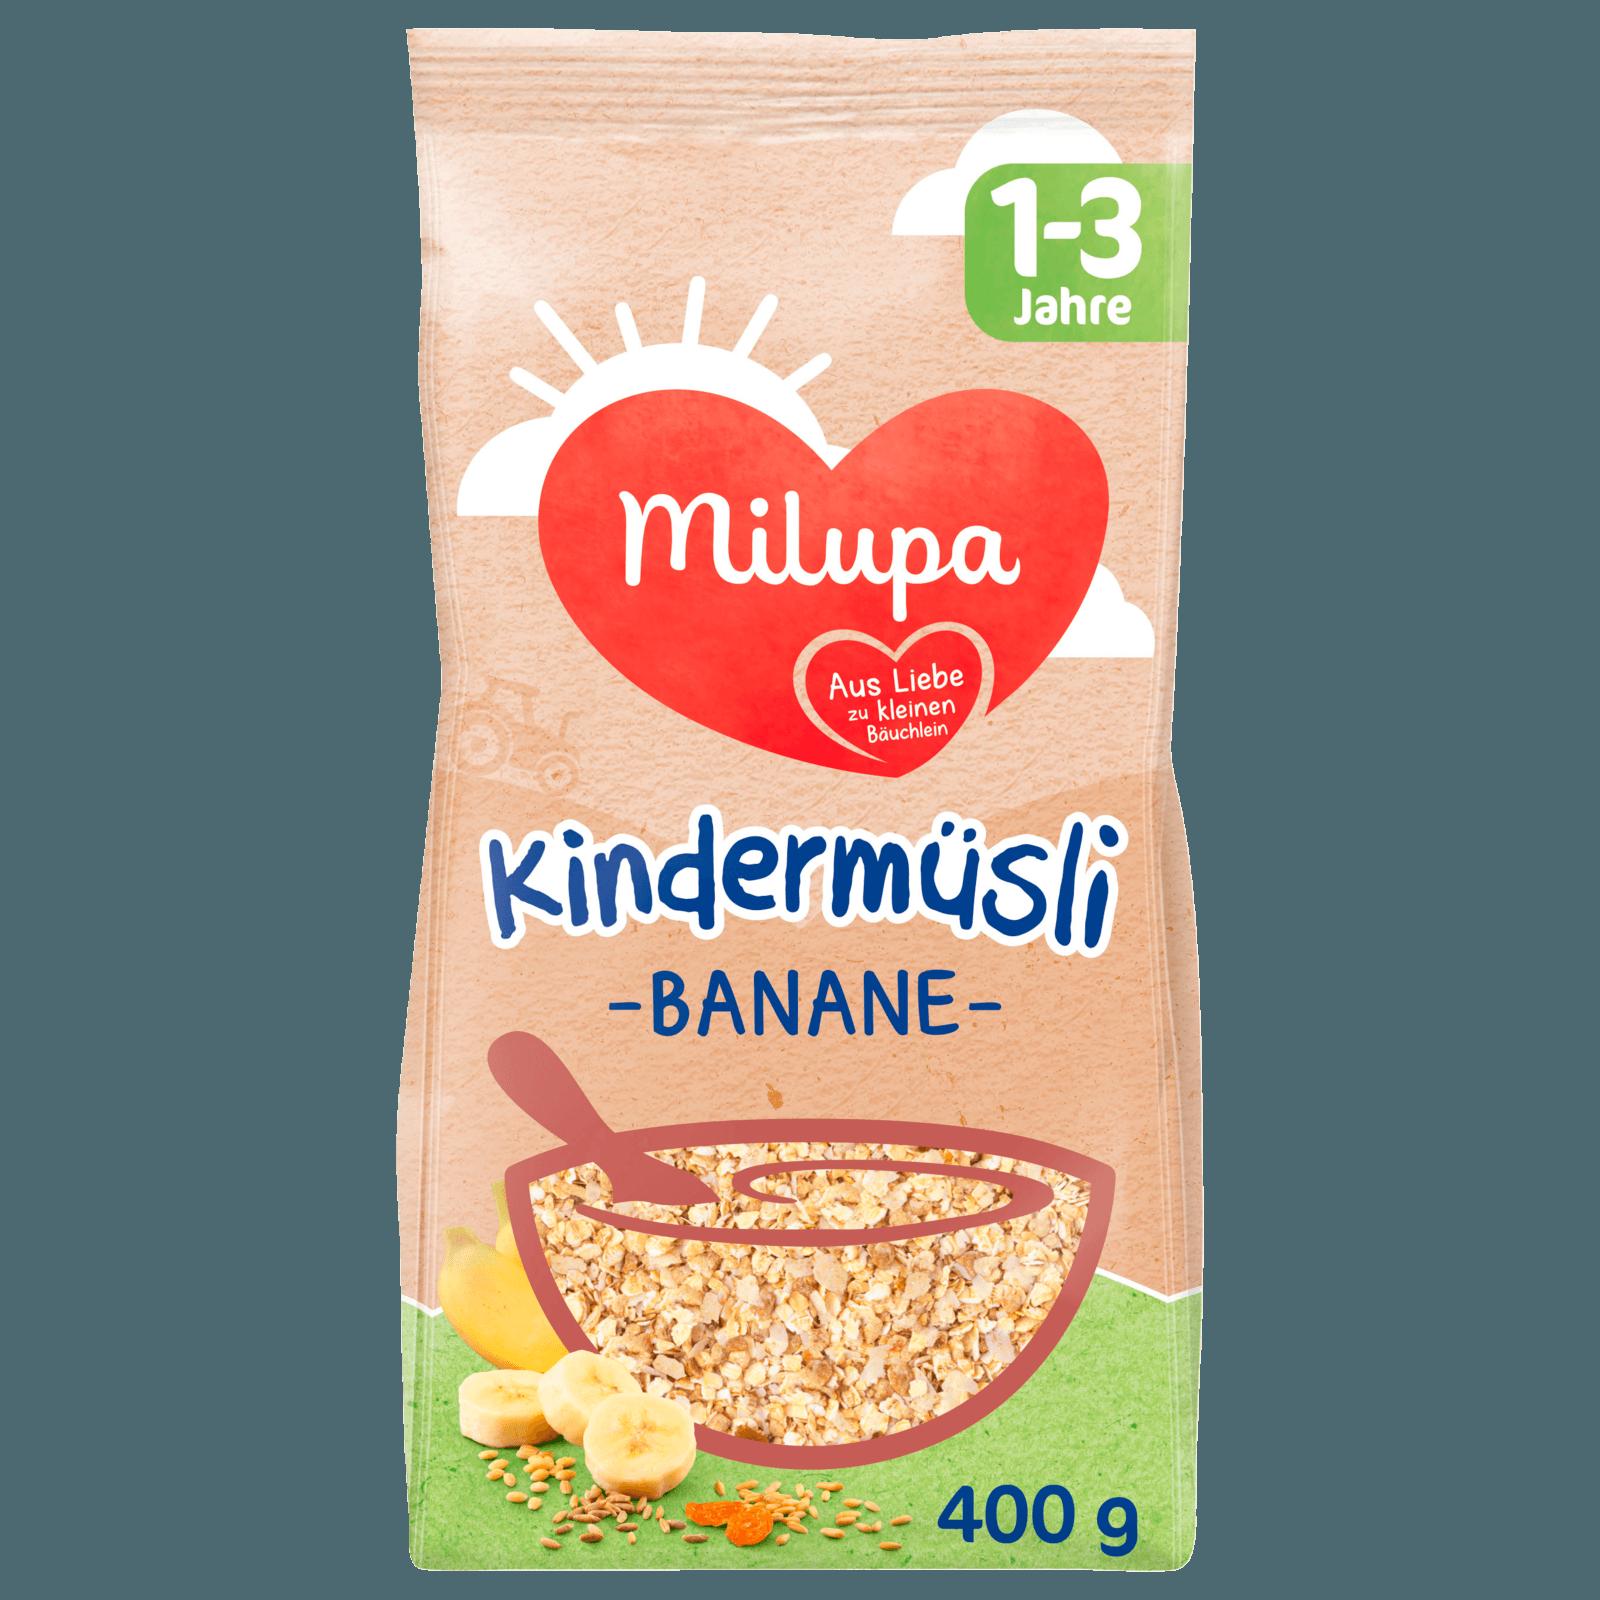 Milupa Kindermüsli Banane 1-3 Jahre 400g